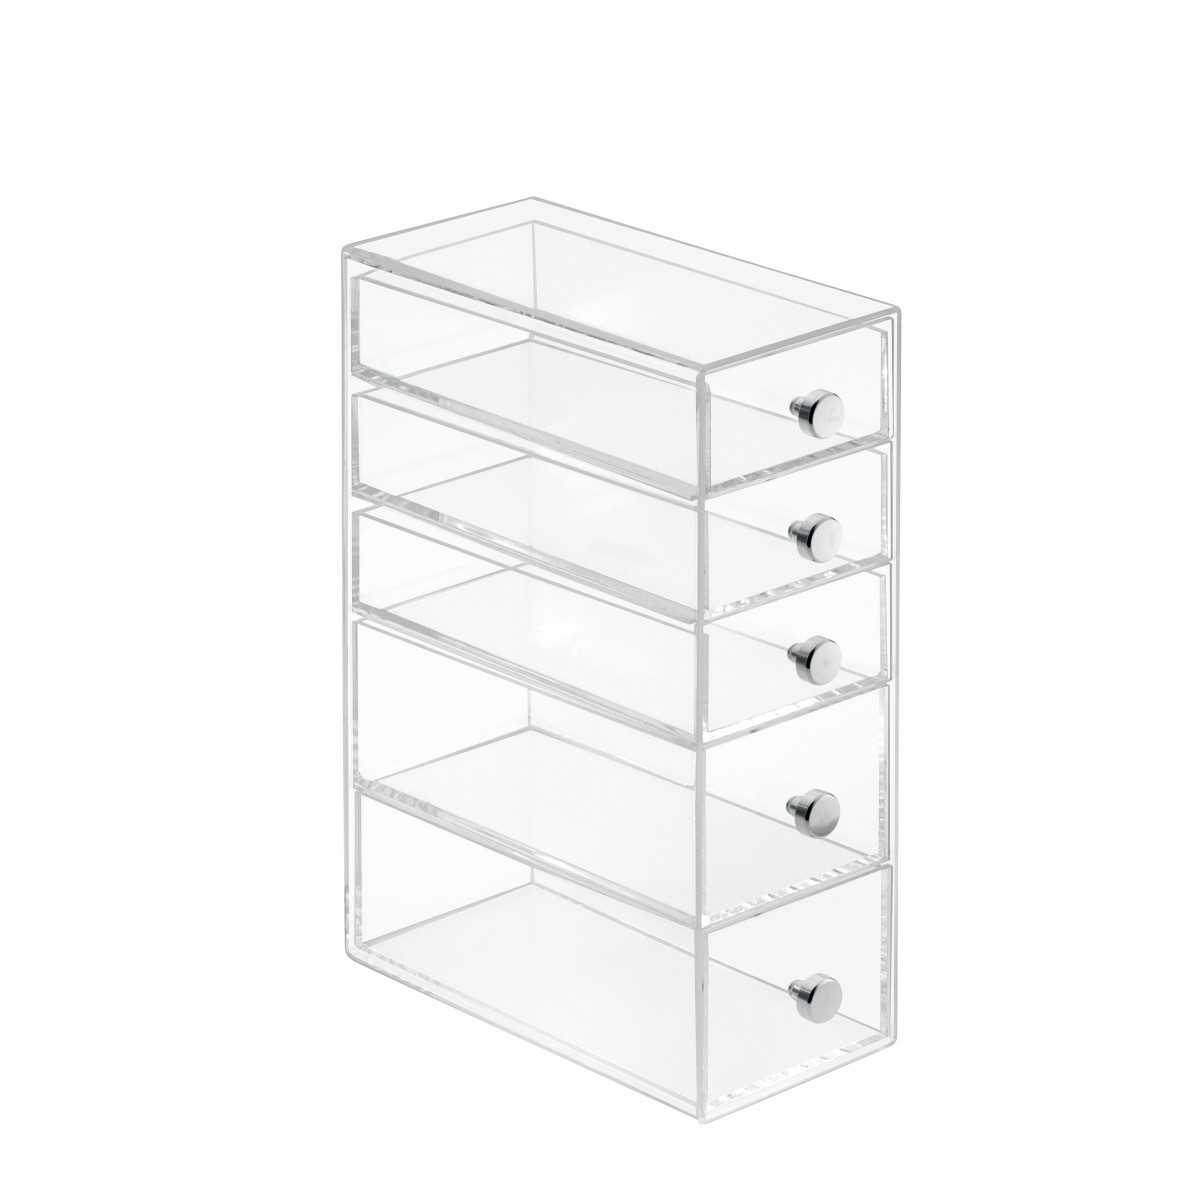 bo te tiroirs transparente rangement maquillage. Black Bedroom Furniture Sets. Home Design Ideas